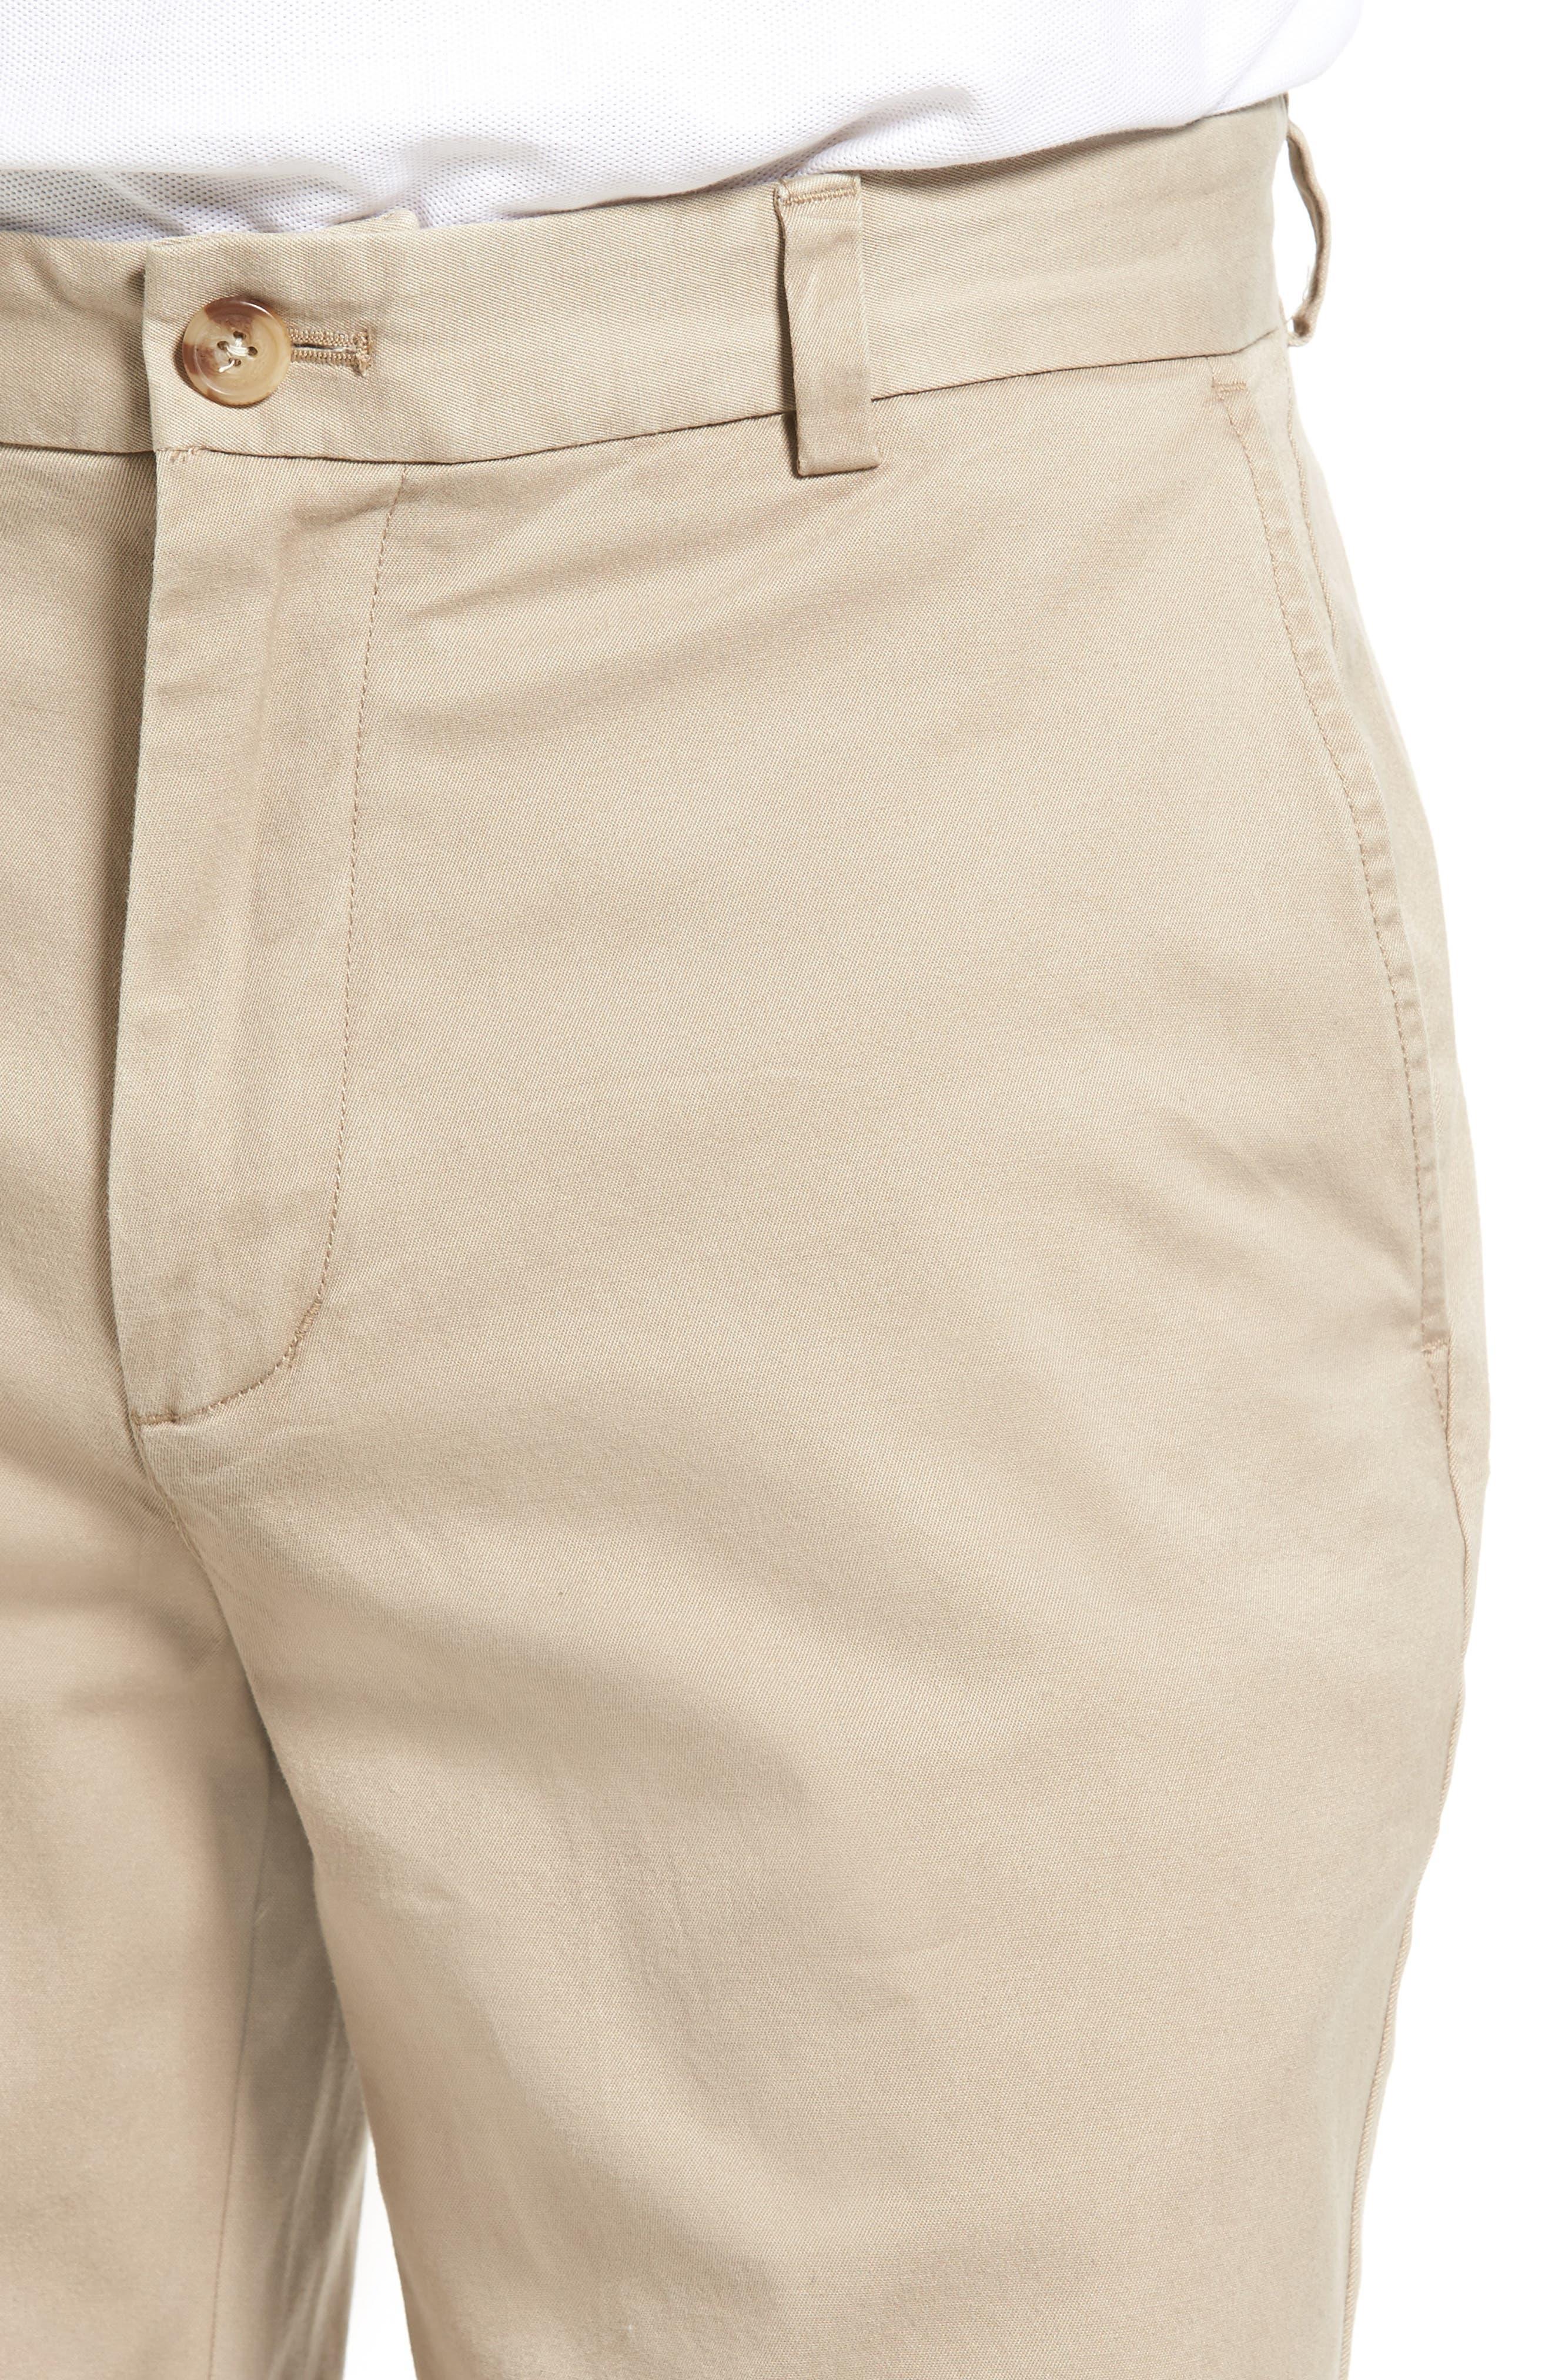 9 Inch Stretch Breaker Shorts,                             Alternate thumbnail 4, color,                             Khaki